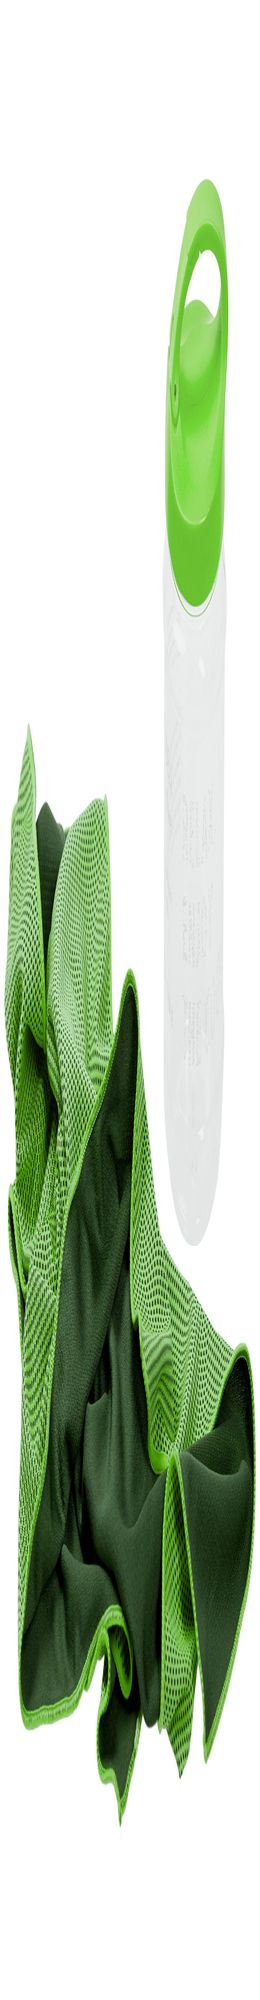 Охлаждающее полотенце Weddell, зеленое фото